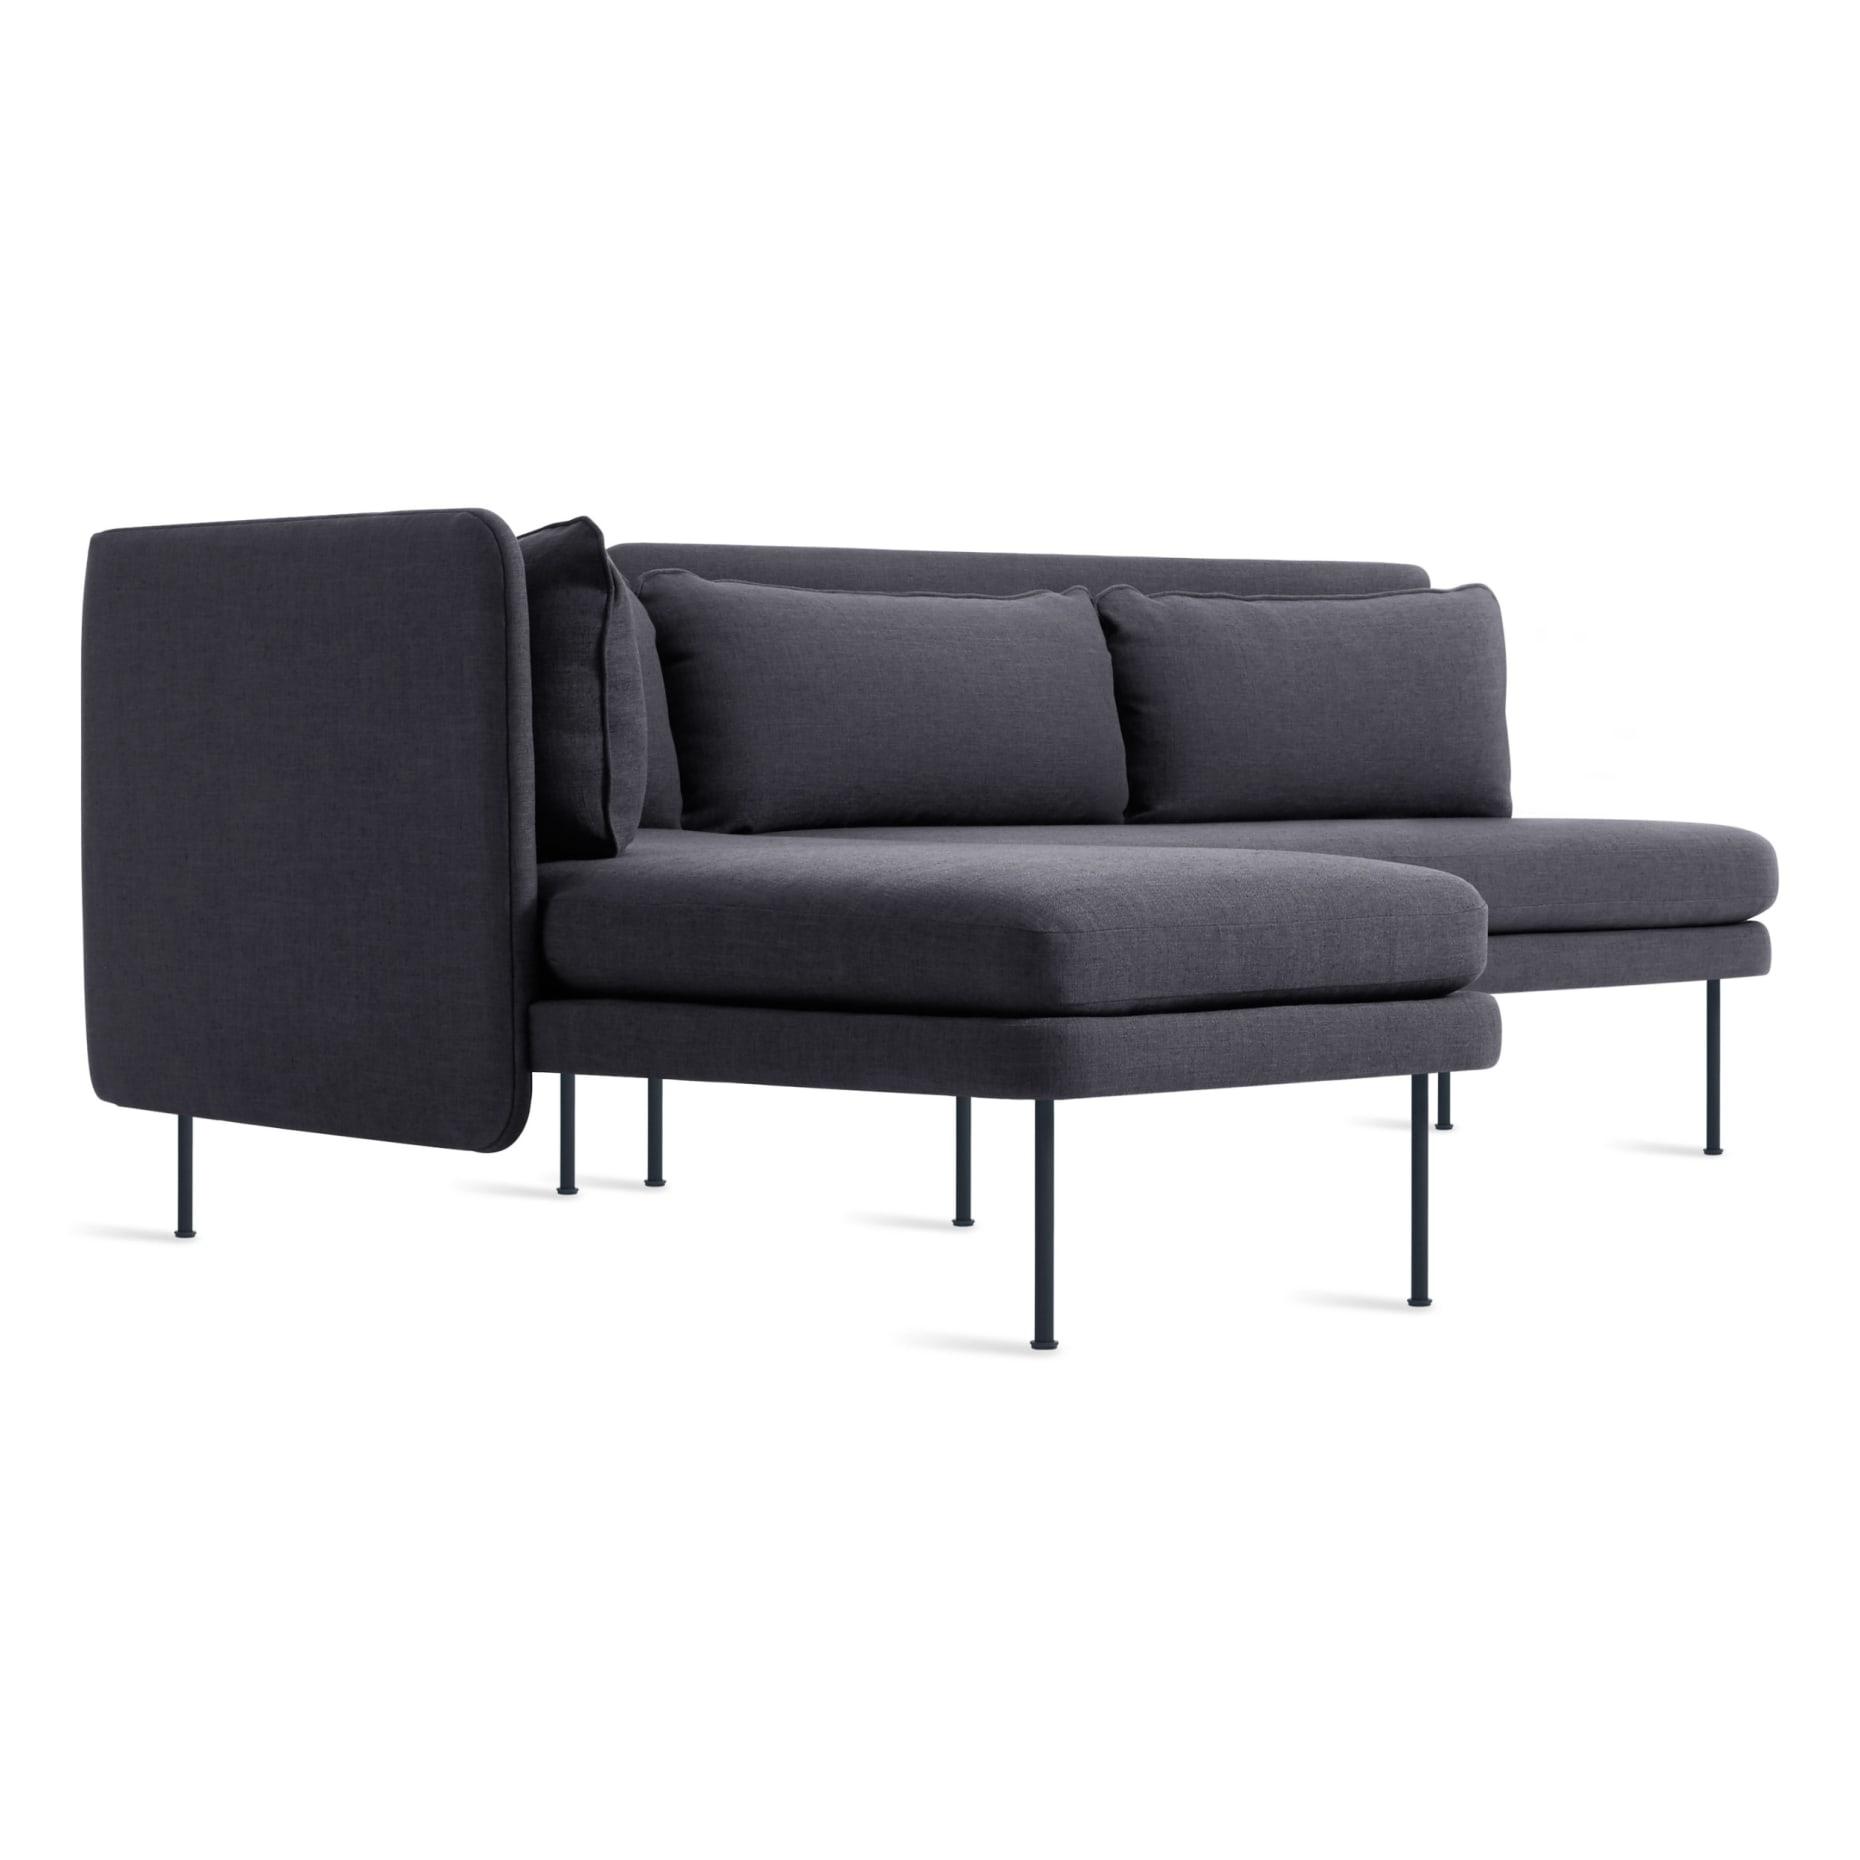 bl1 lchnam bl 34 bloke armless sofa w left chaise rostenkowski blue